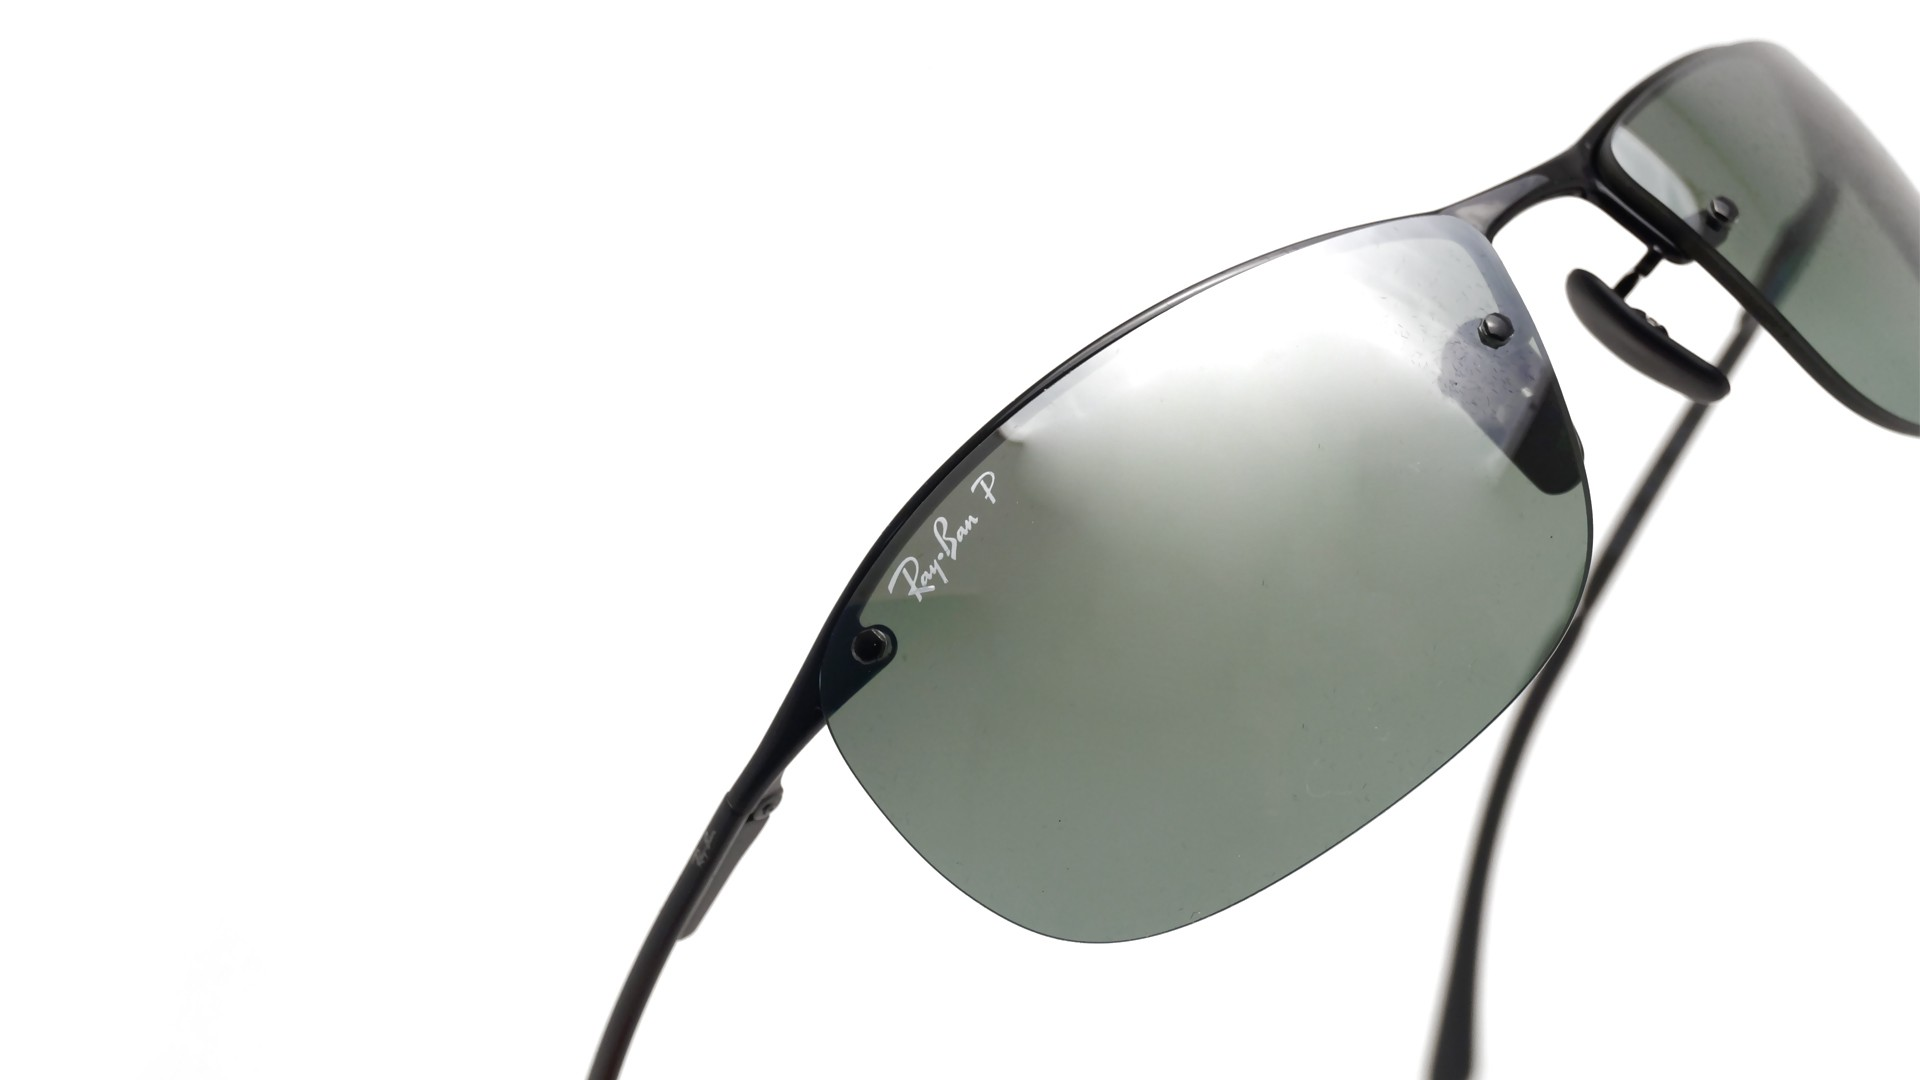 389c4c3688 Sunglasses Ray-Ban RB3542 002 5L 63-15 Black Large Polarized Mirror